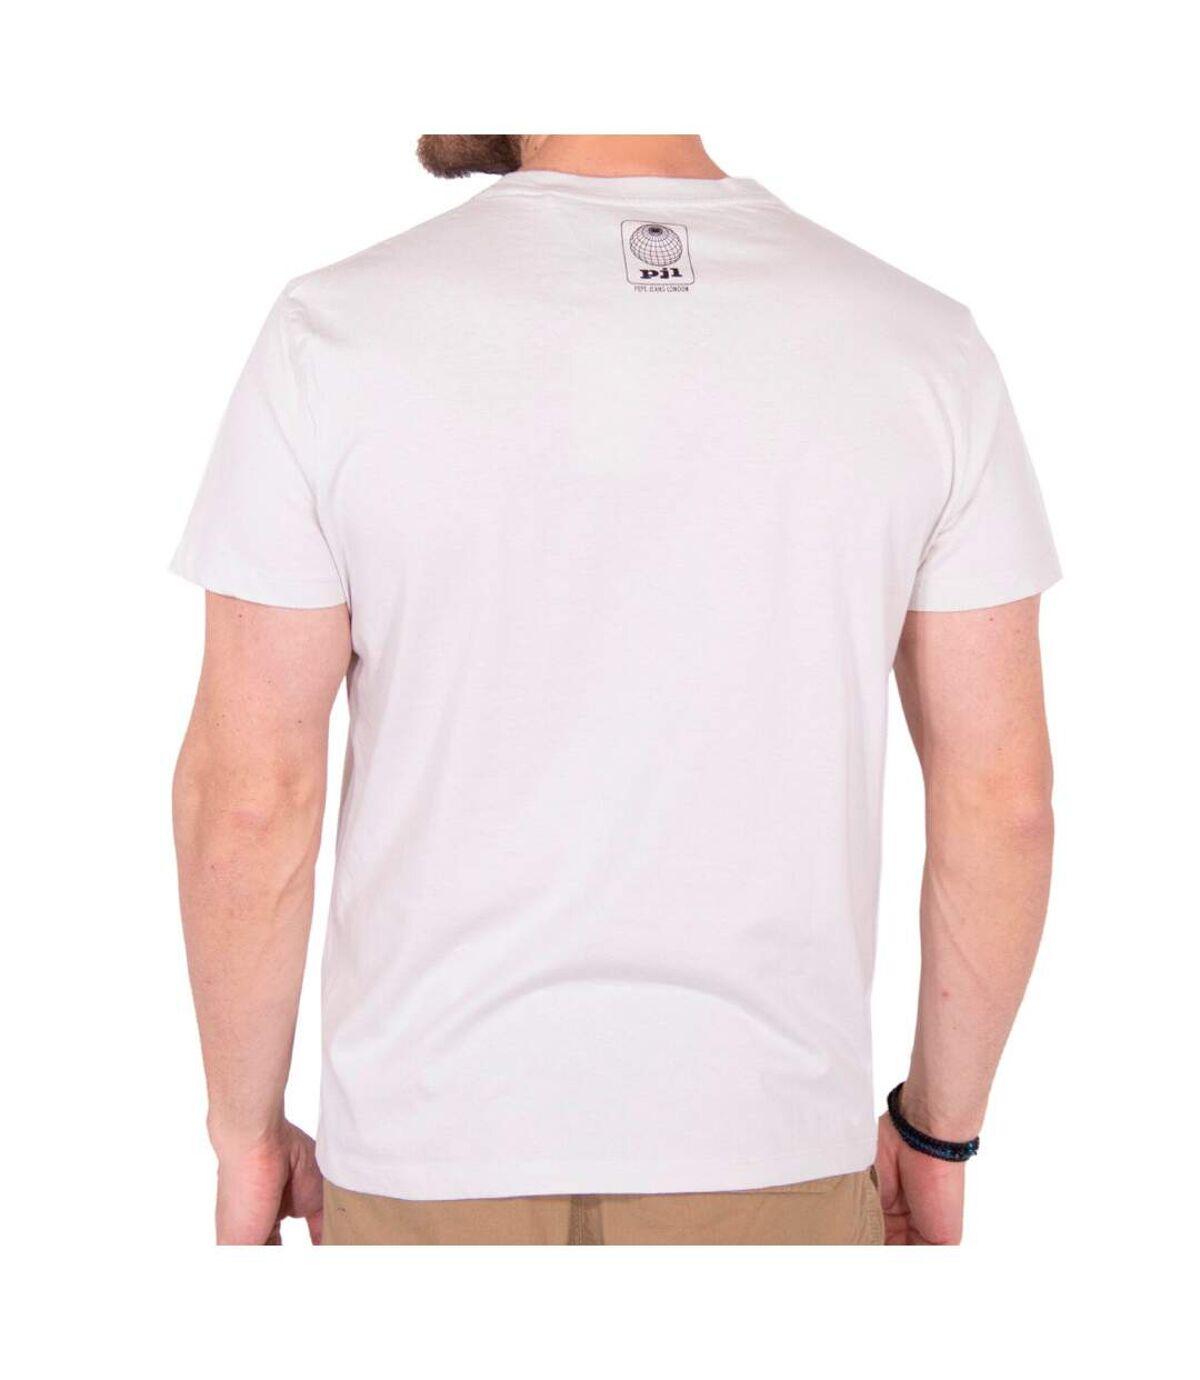 T-Shirt blanc homme Pepe Jeans Berwick